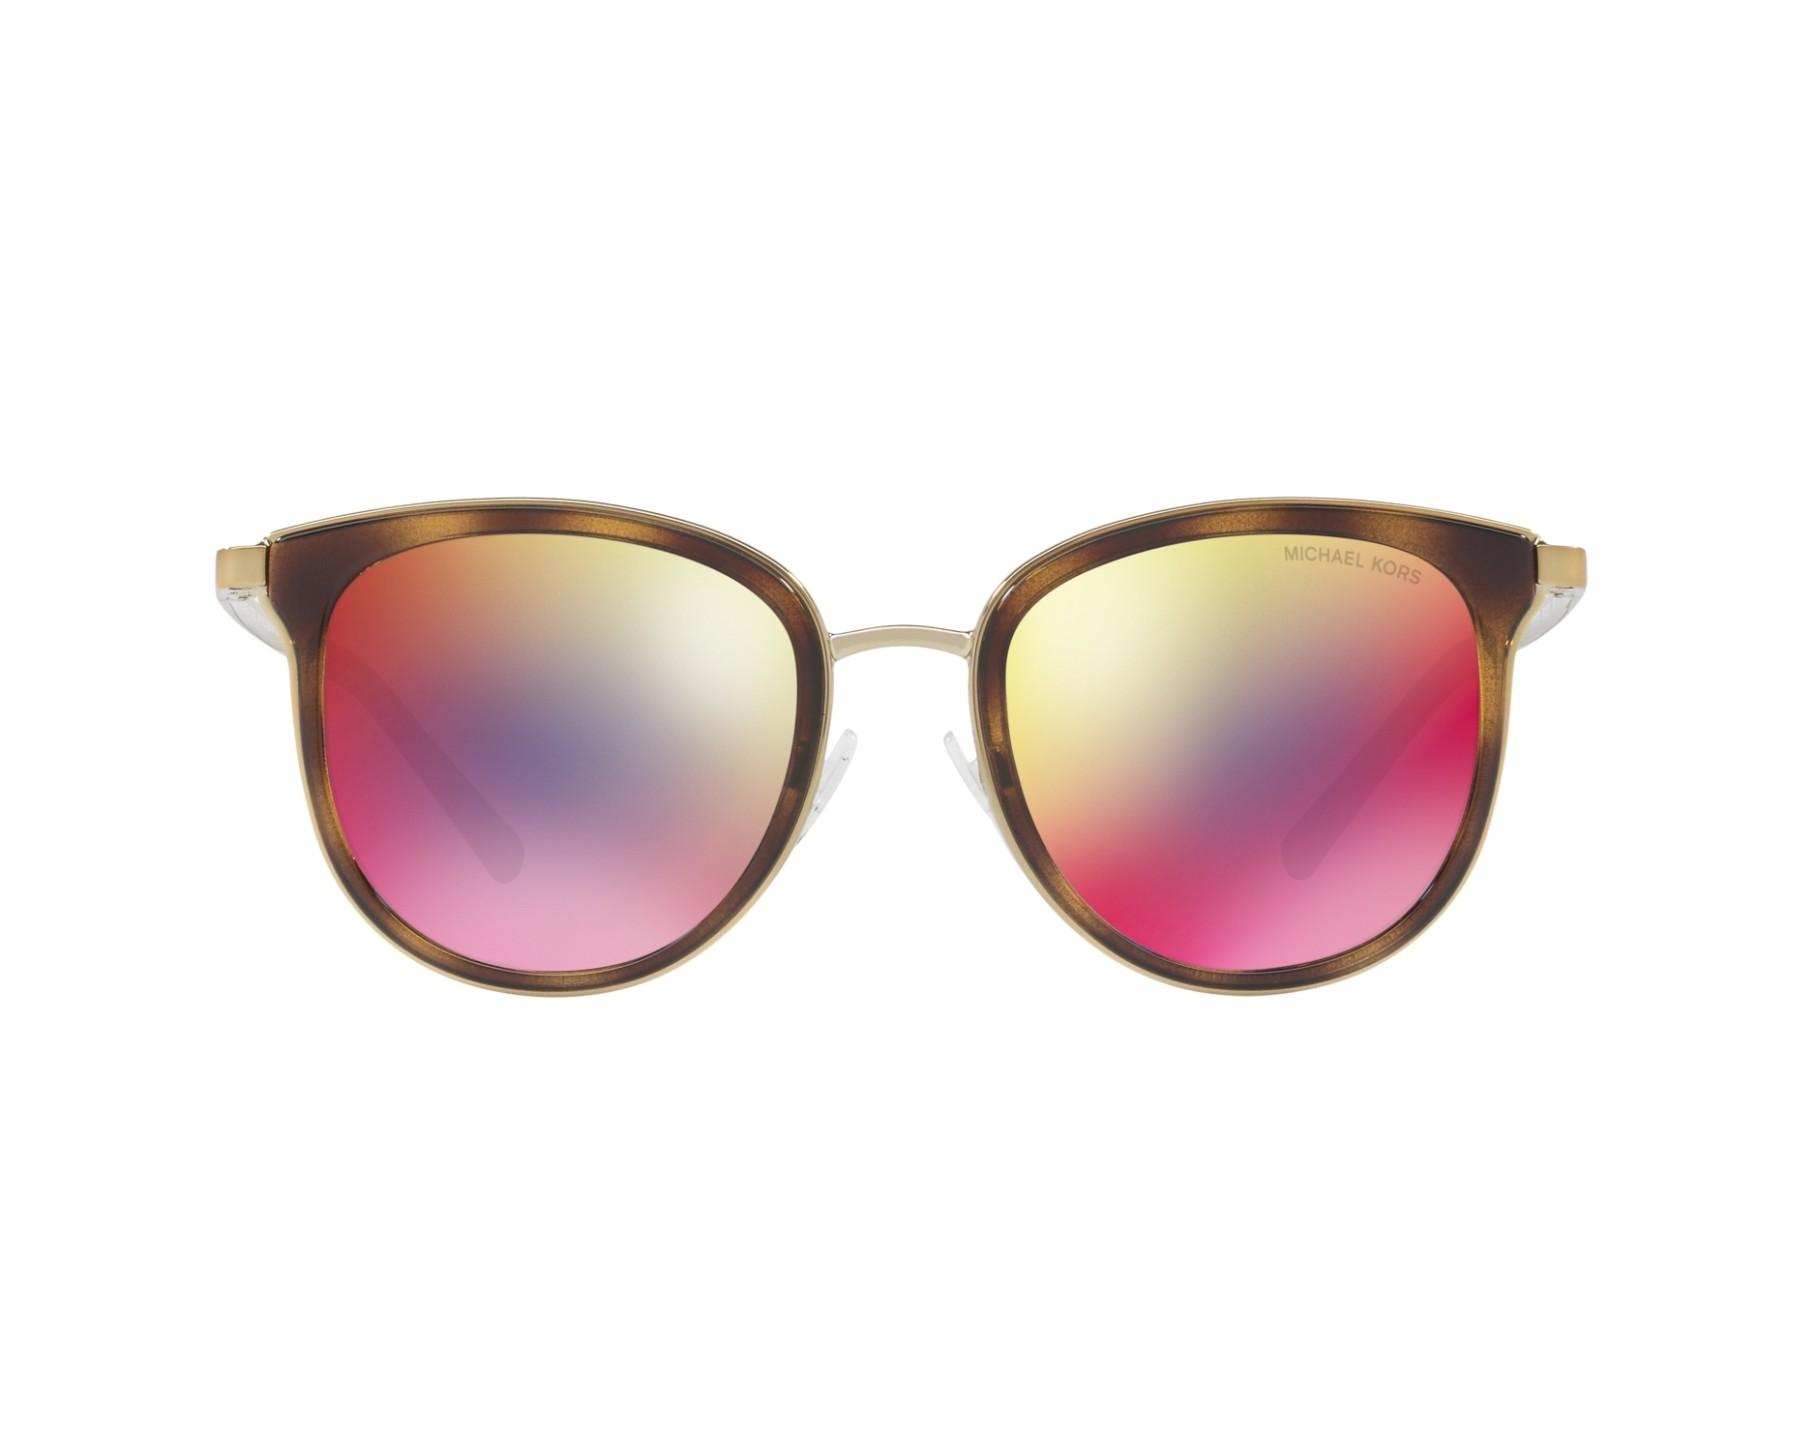 c2755a23143f Sunglasses Michael Kors MK-1010 11016P 54-20 Havana Gold 360 degree view 1